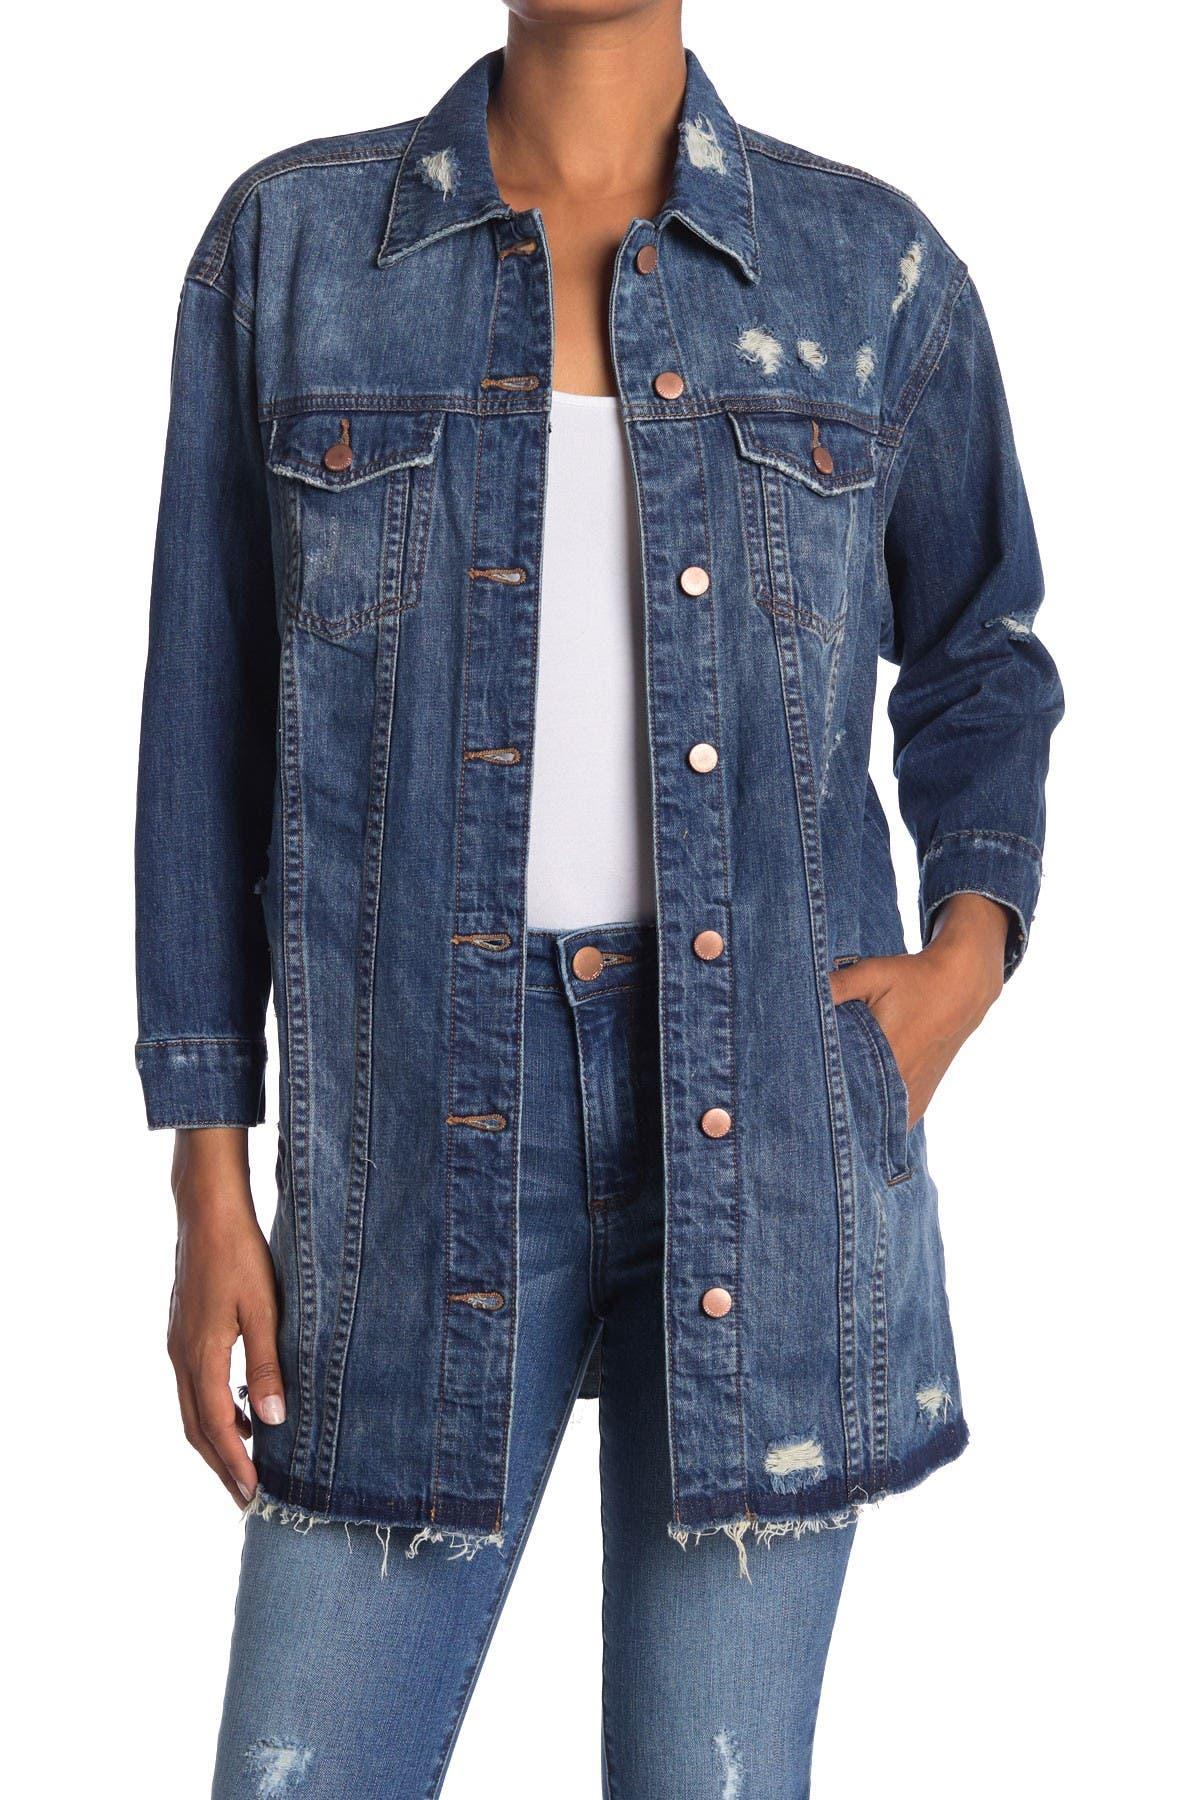 STS BLUE Oversized Boyfriend Denim Jacket